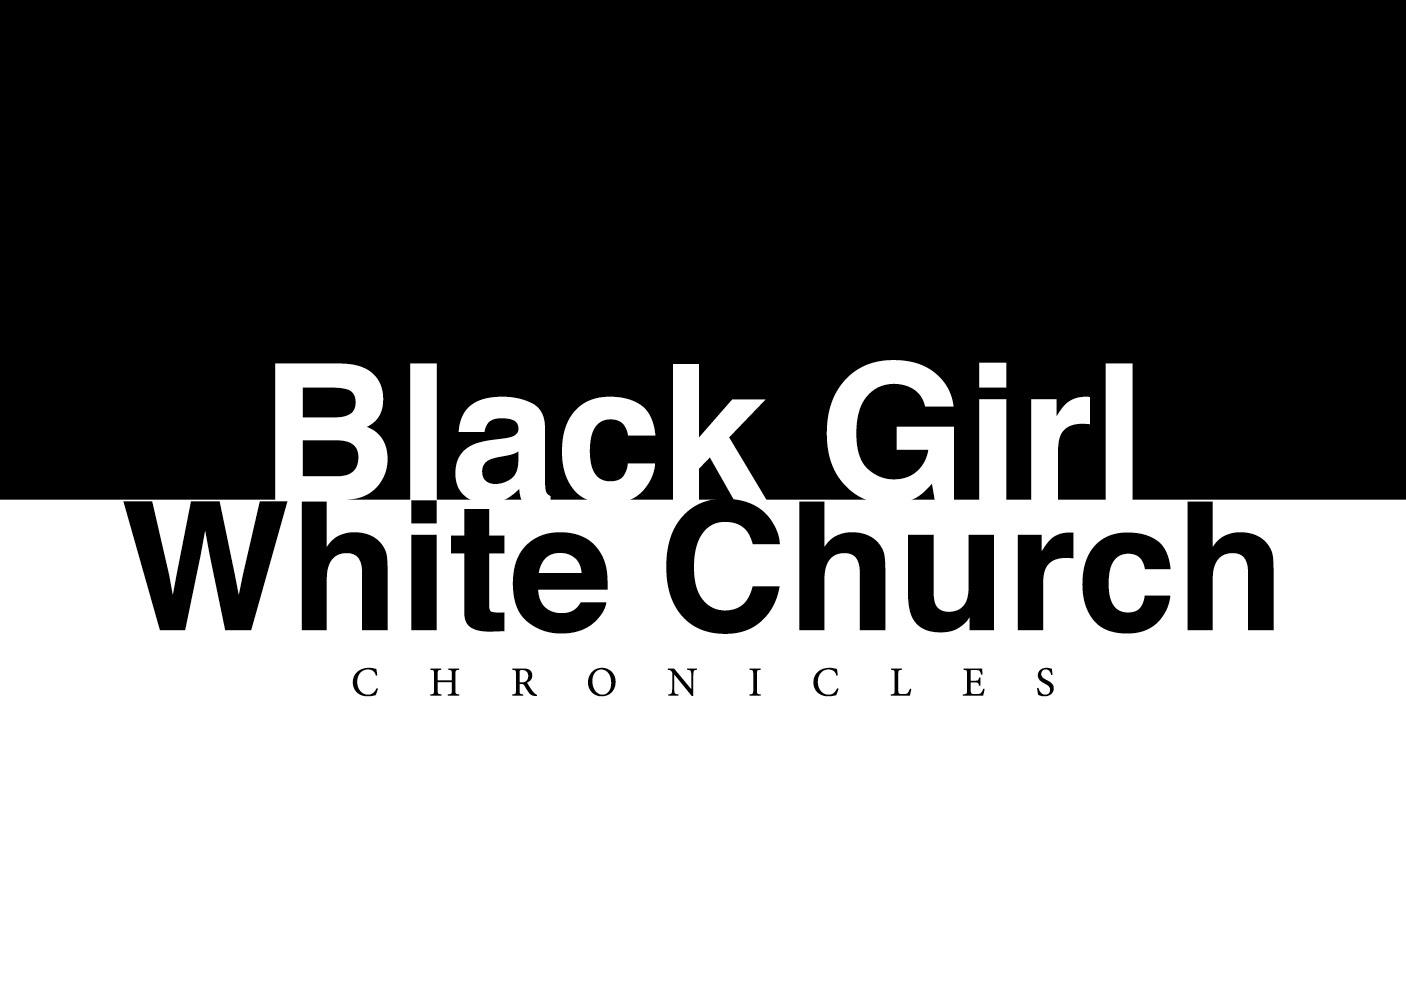 Black Girl White Church Chronicles: Part One